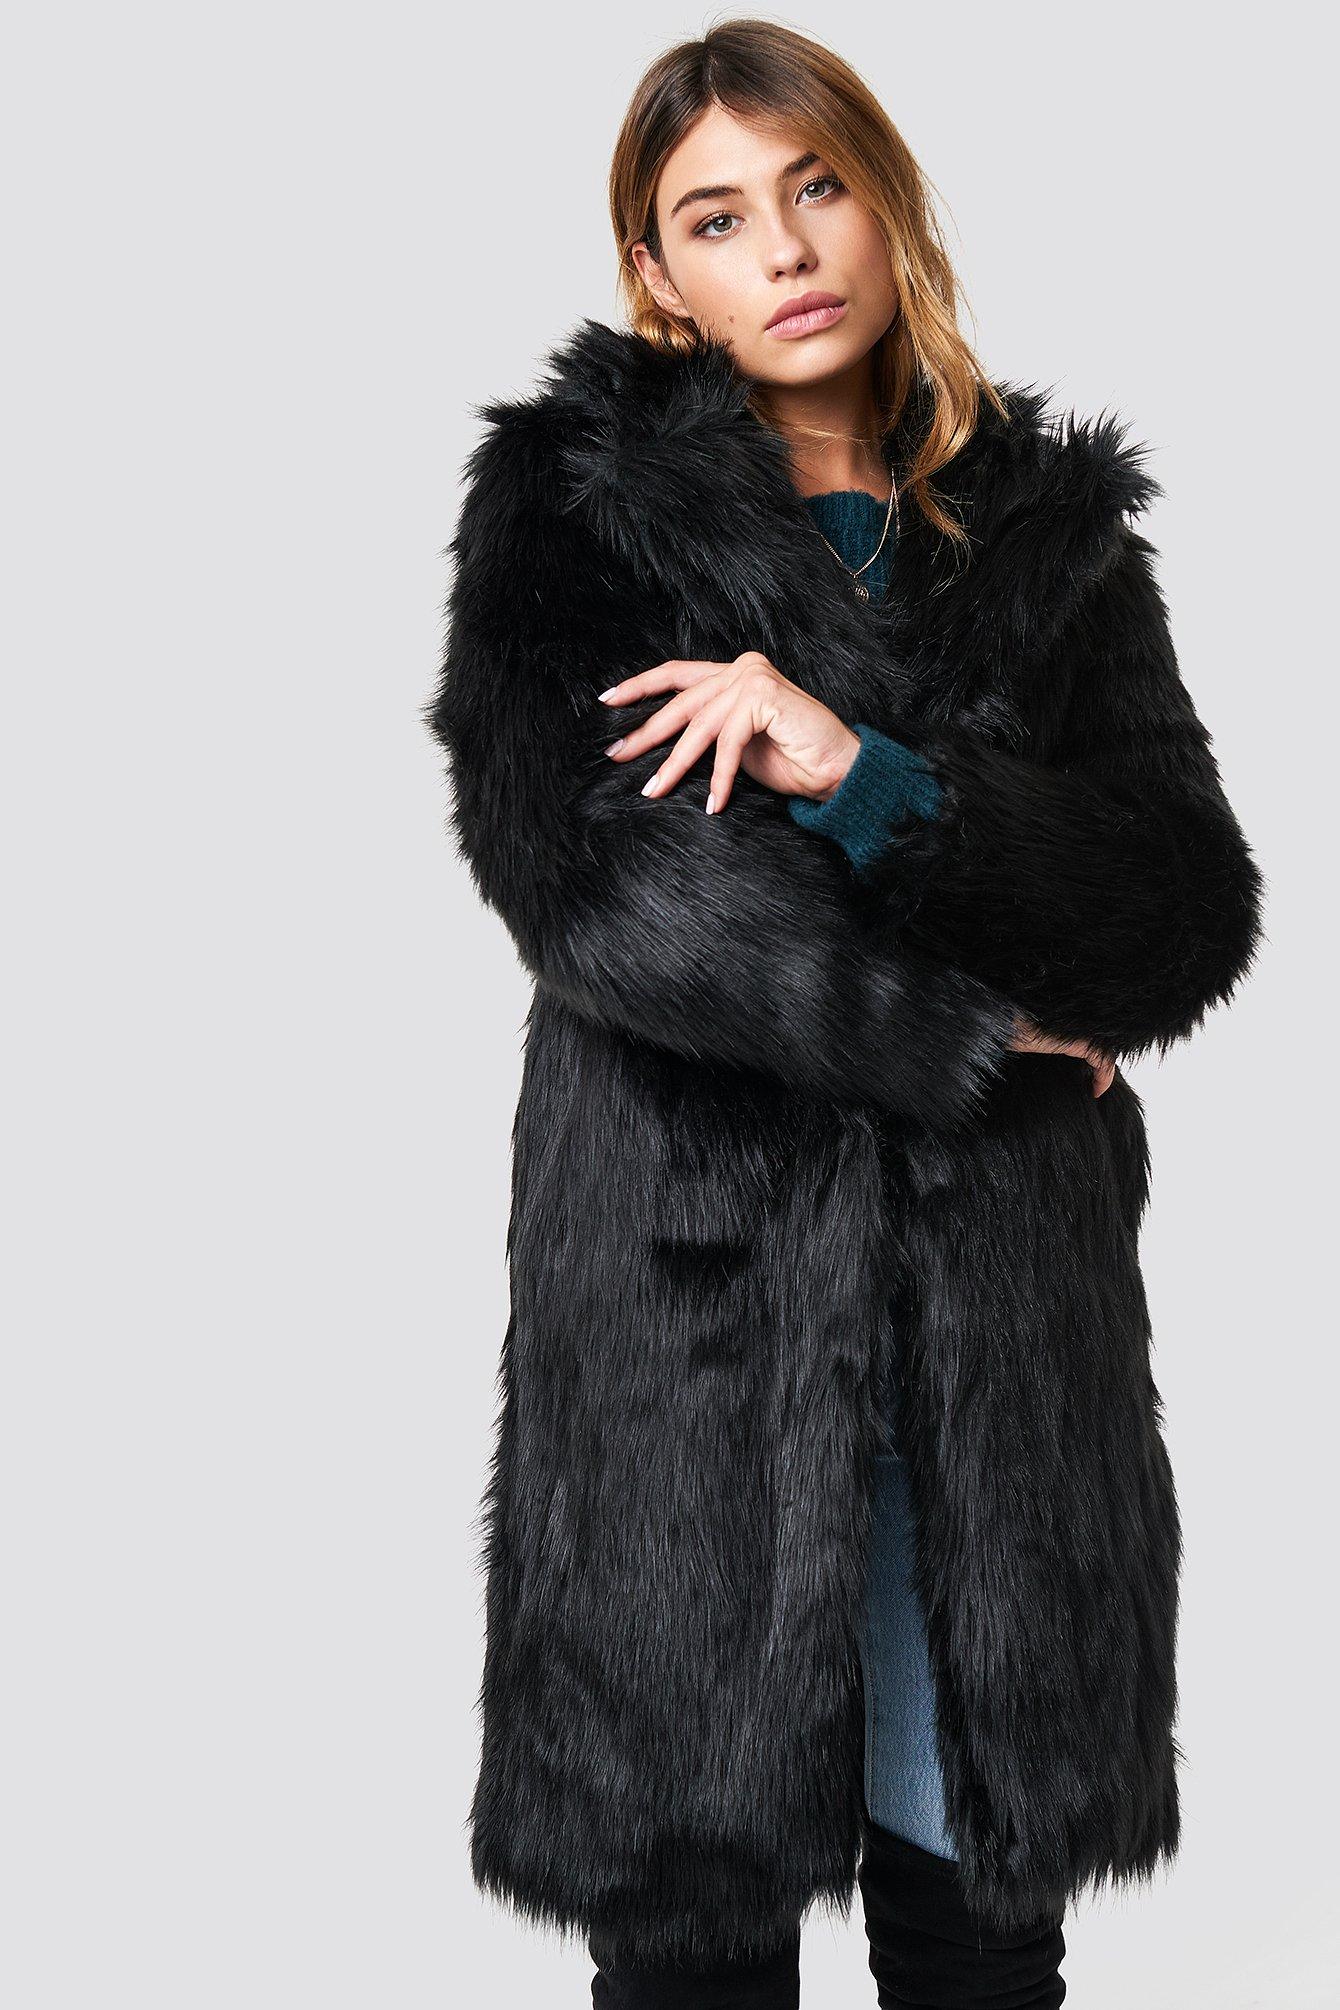 linn ahlborg x na-kd -  Long Faux Fur Coat - Black